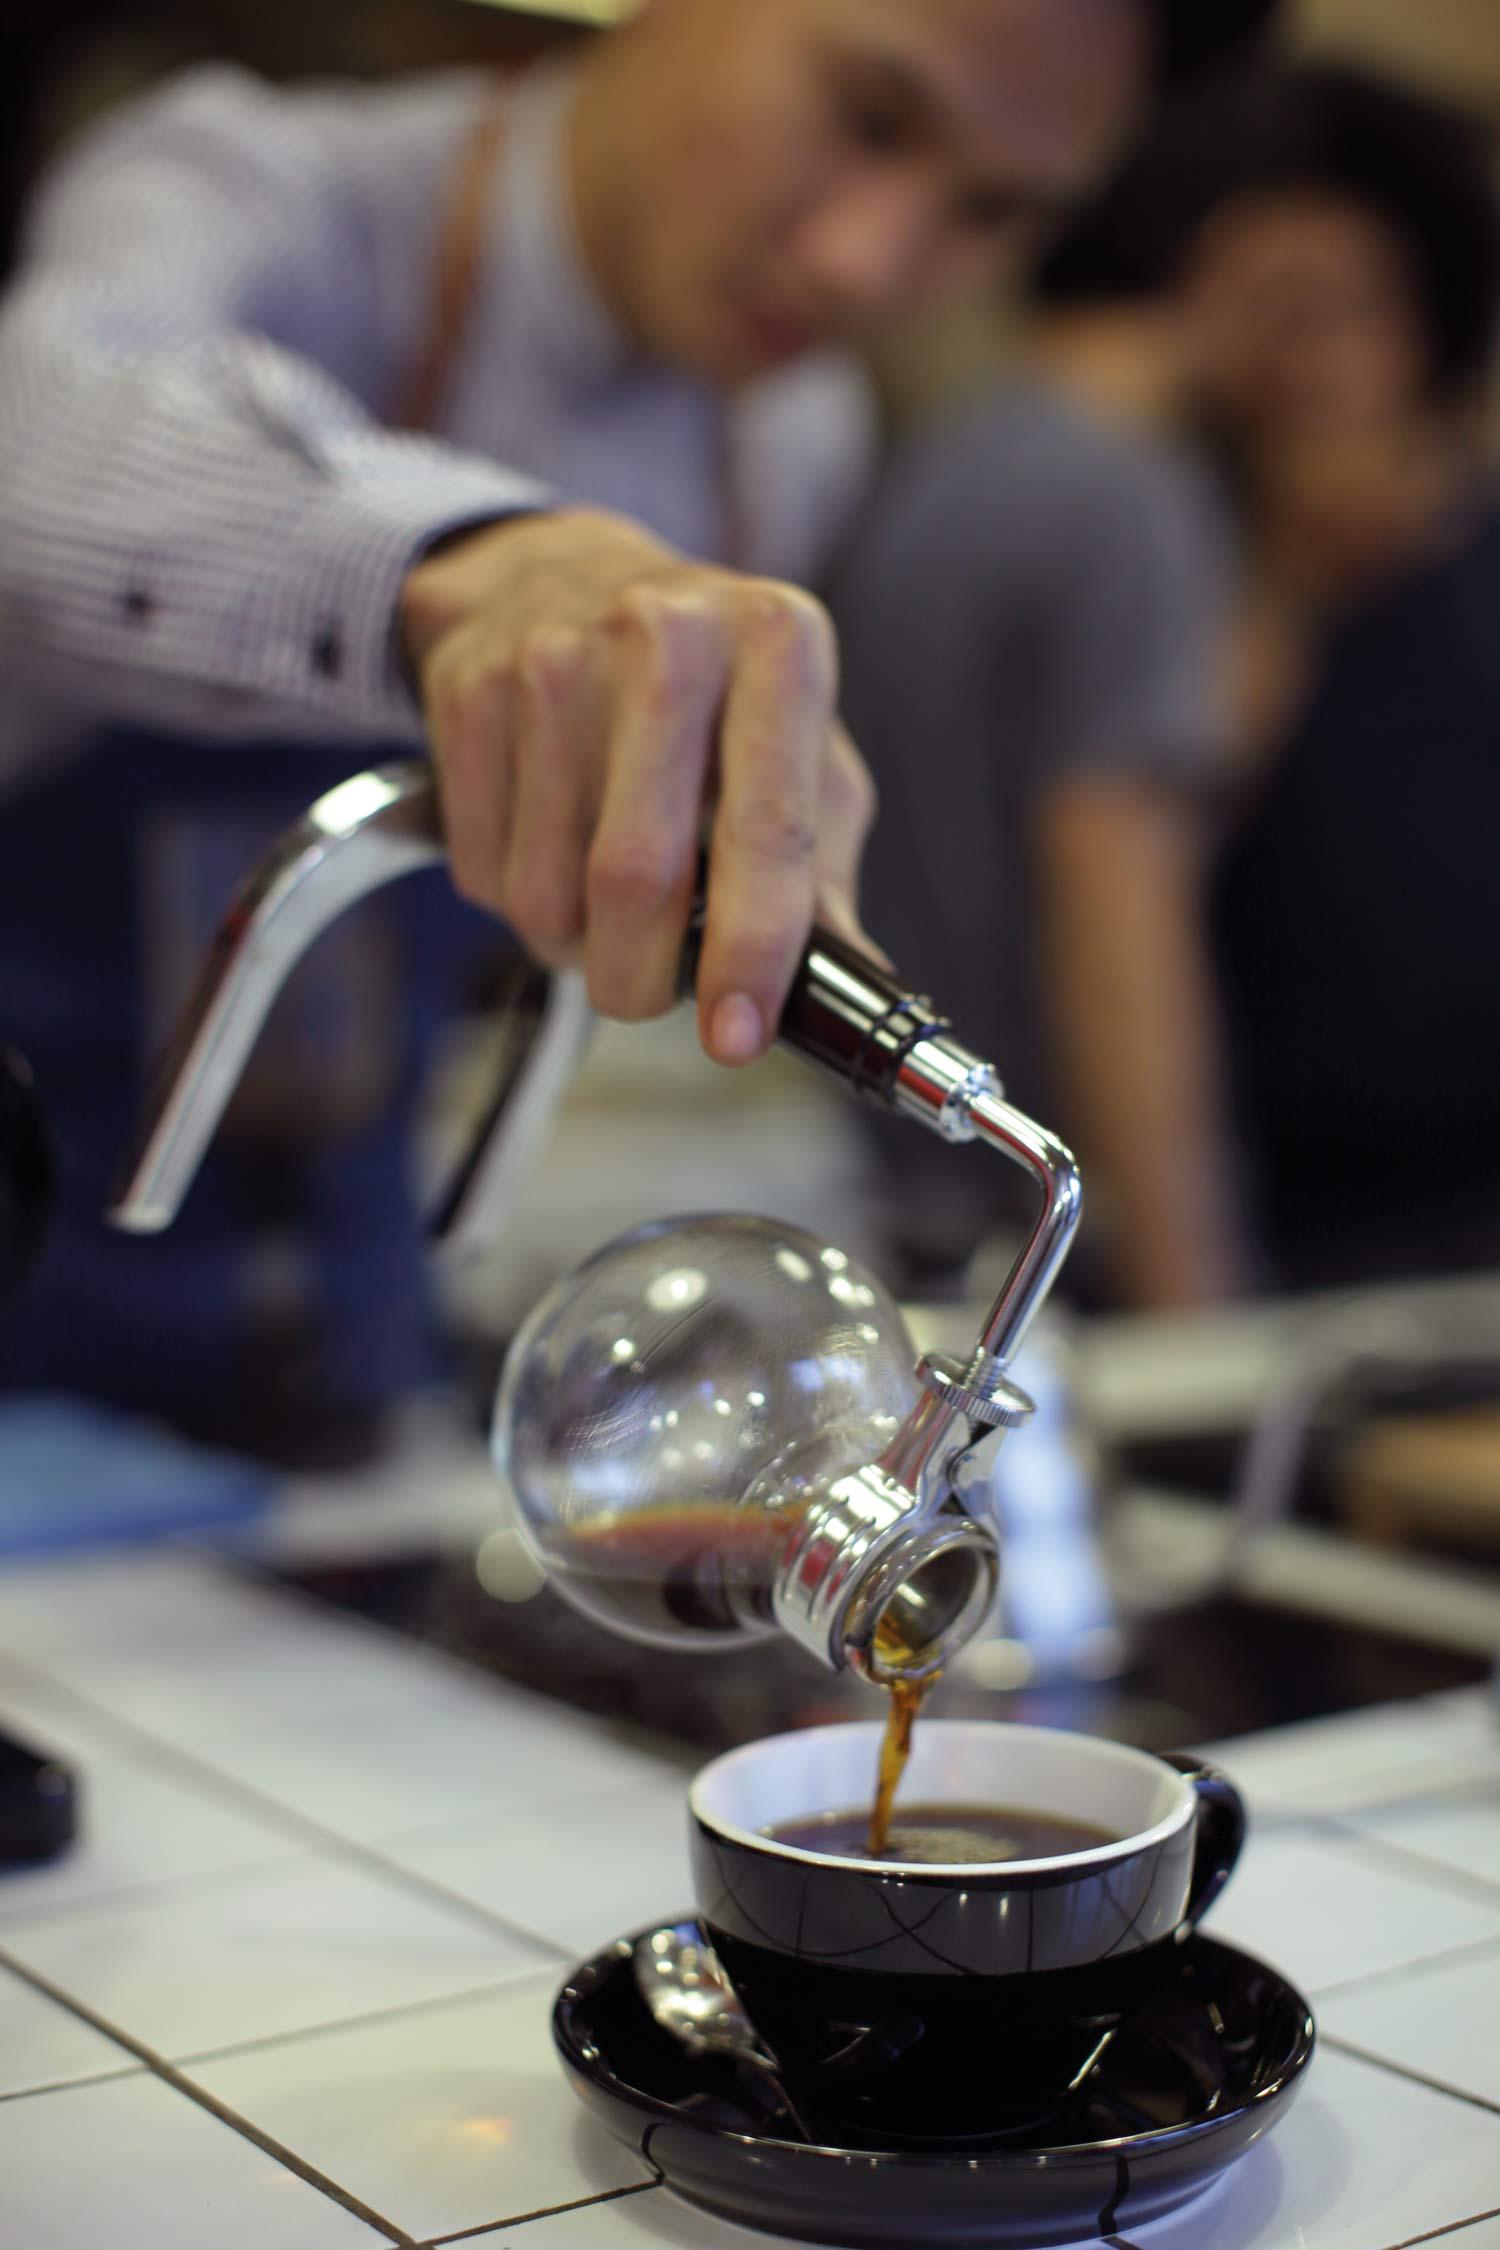 Filosofi Kopi Cafe Jadi Incaran Anak Muda Jakarta